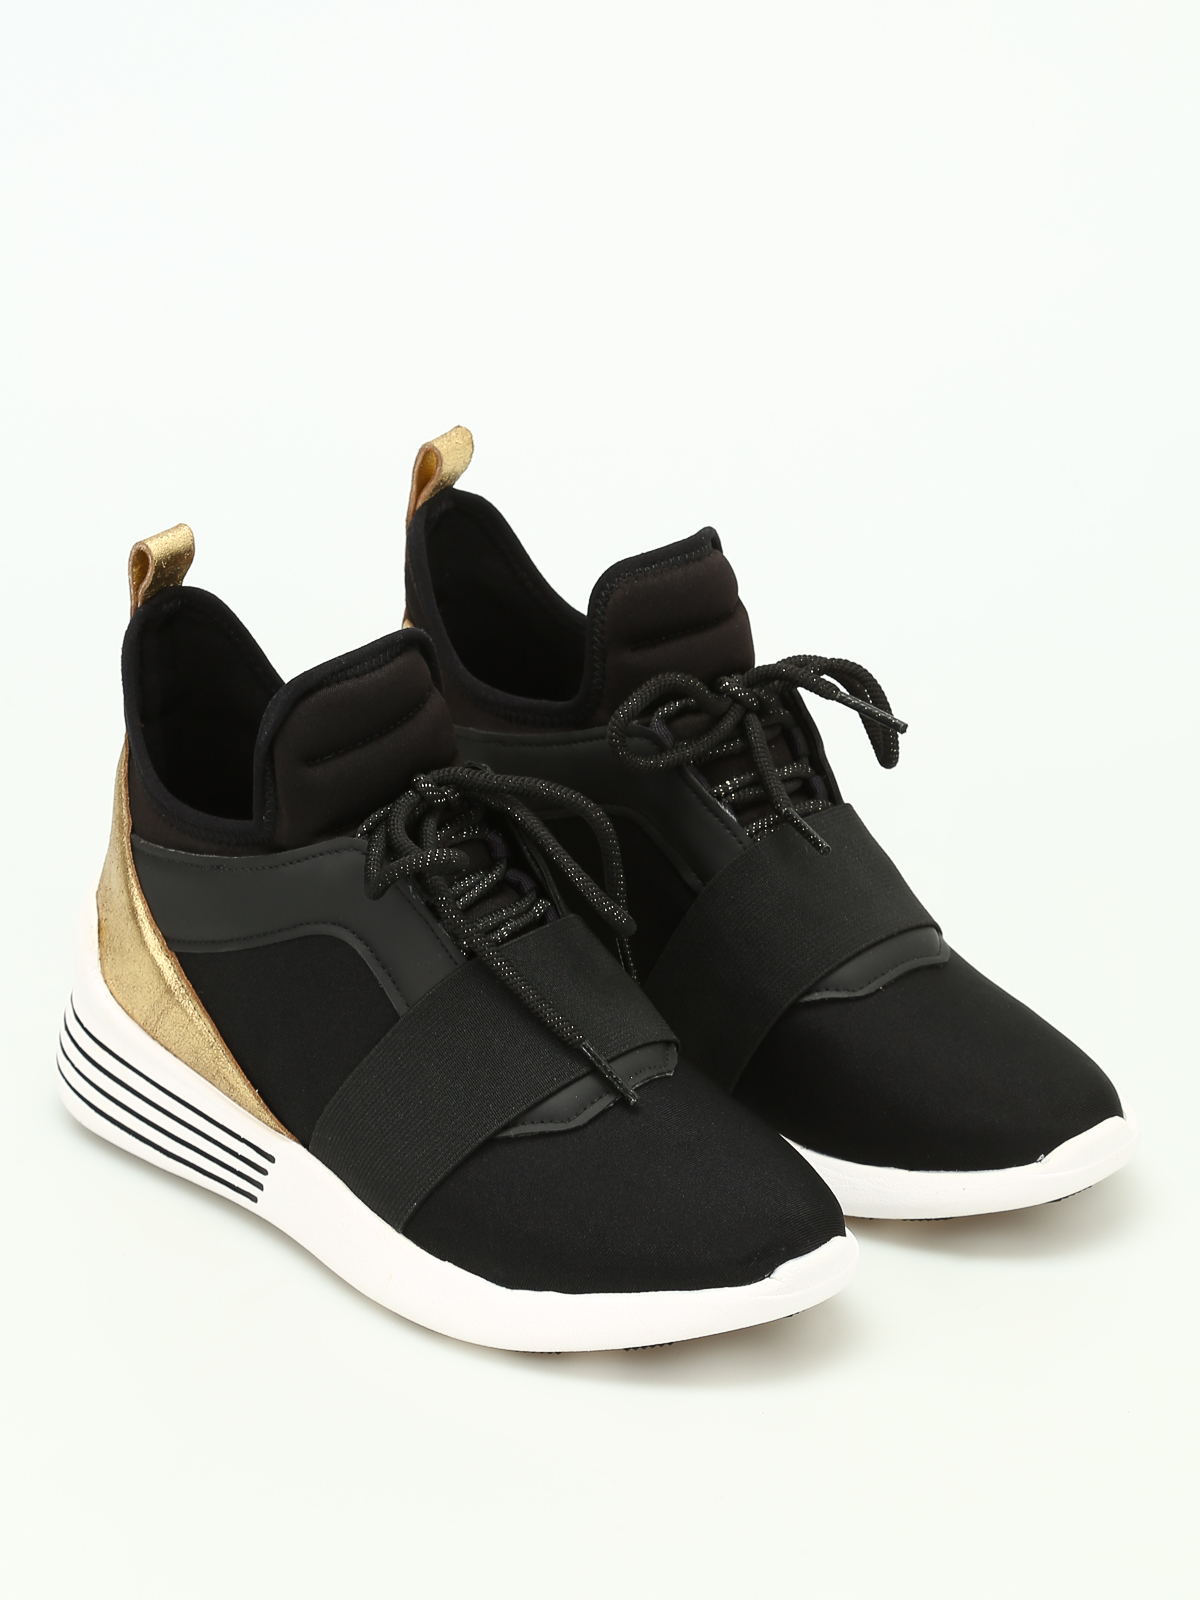 bonne texture bon service bon ajustement Kendall + Kylie - Baskets - Braydin - Chaussures de sport ...